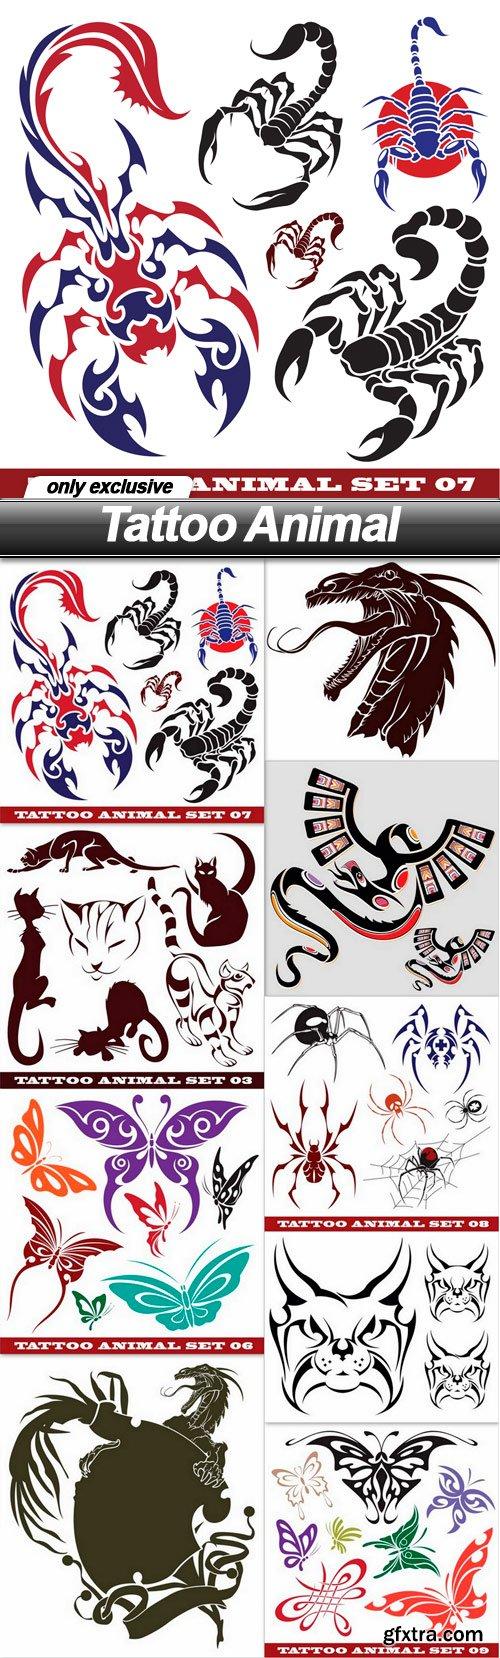 Tattoo Animal - 9 EPS